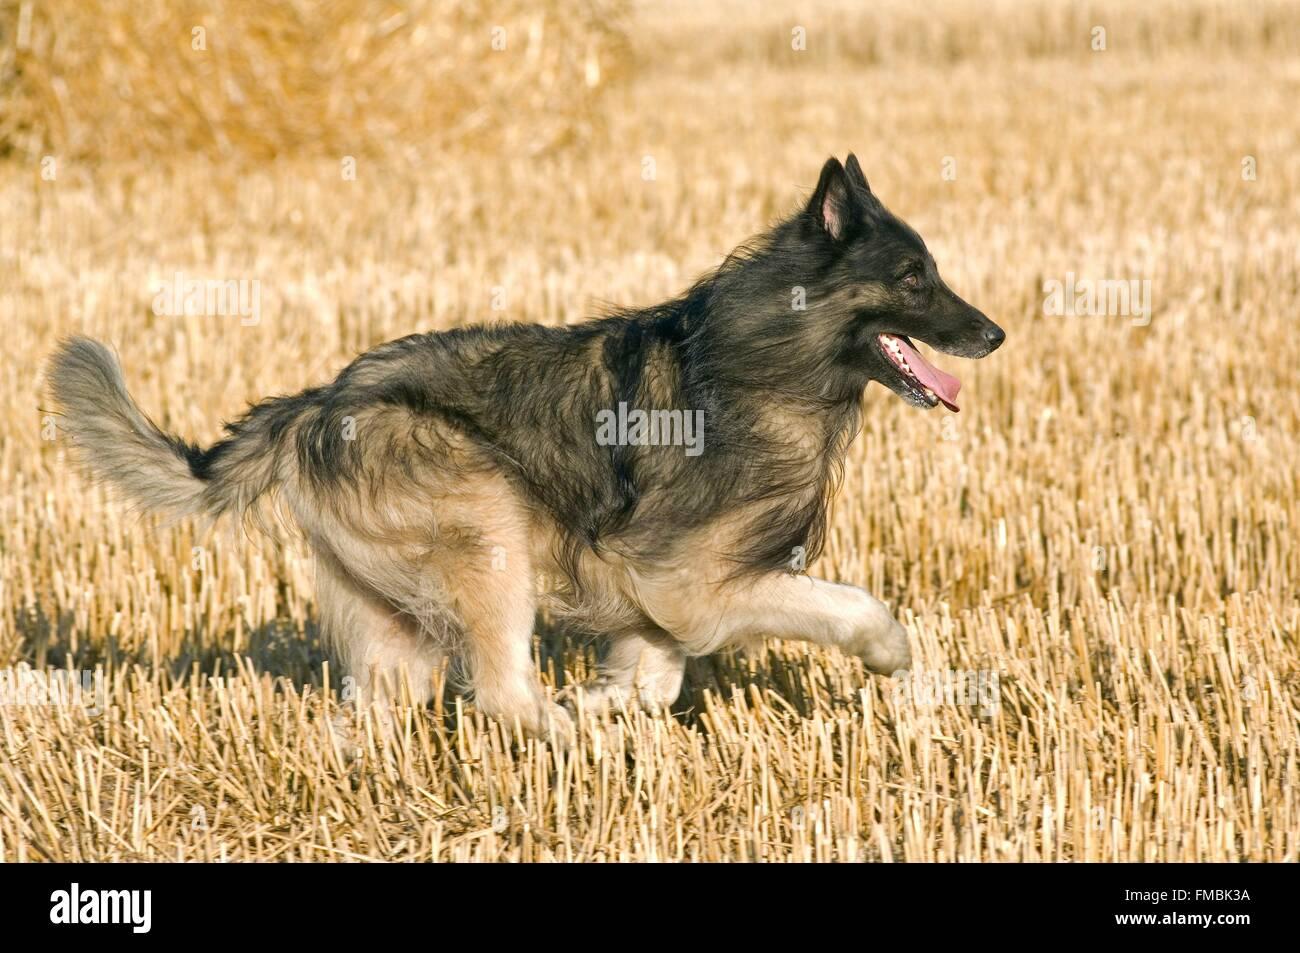 Tervuren (Canis familiaris) - Stock Image